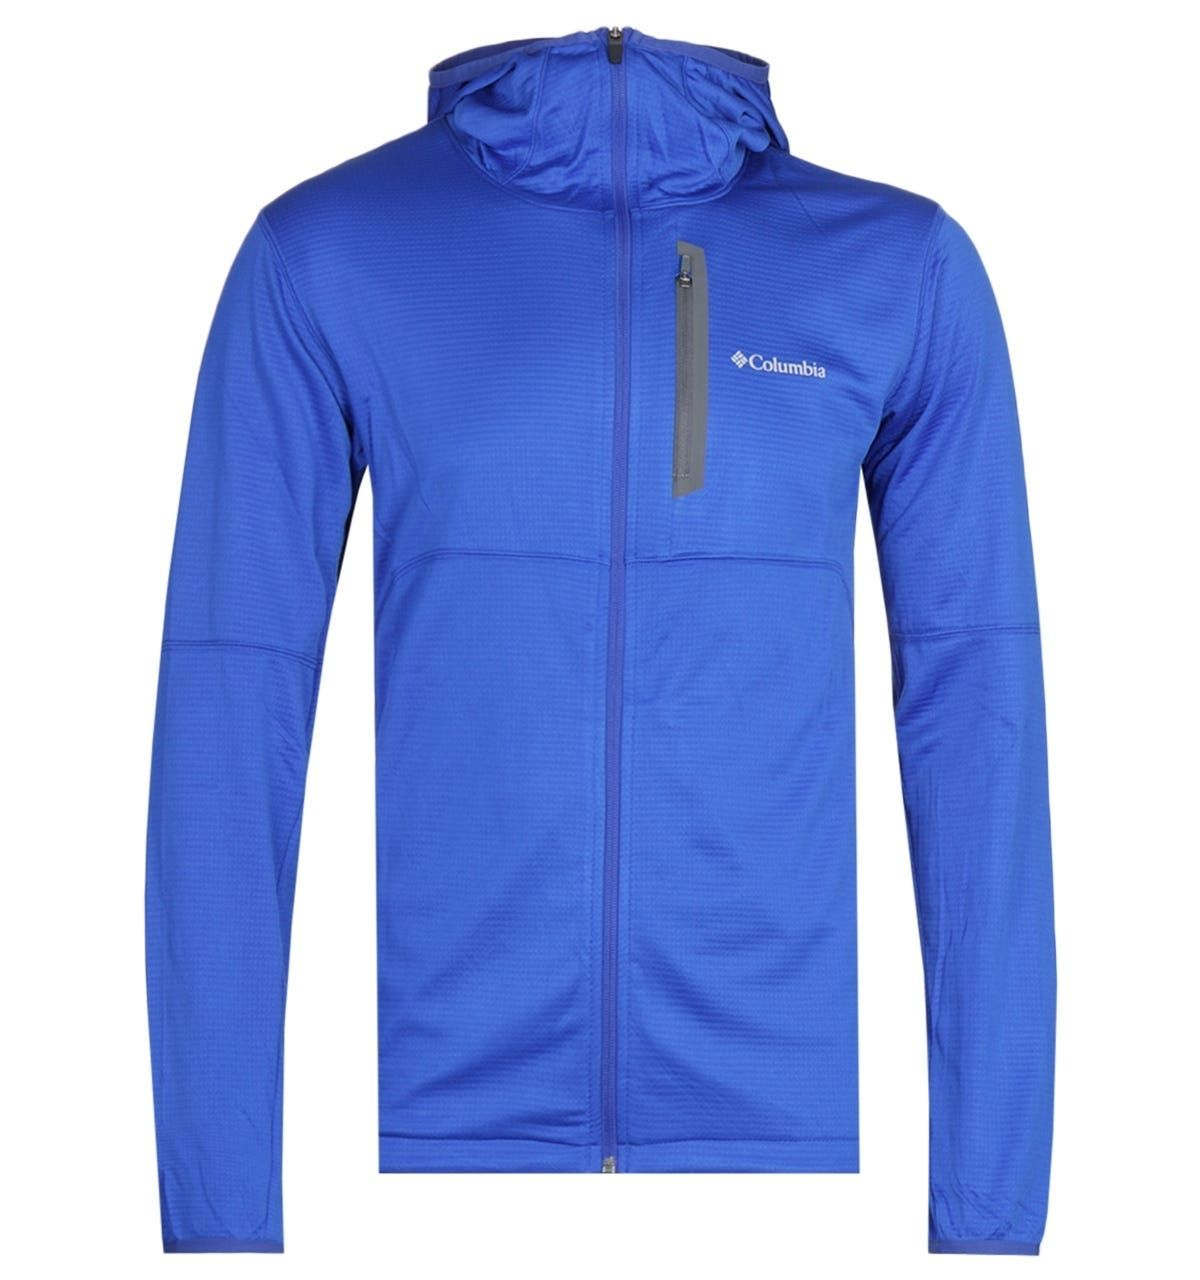 Columbia Tech Trial Lightweight Zip Through Electric Blue Hoodie